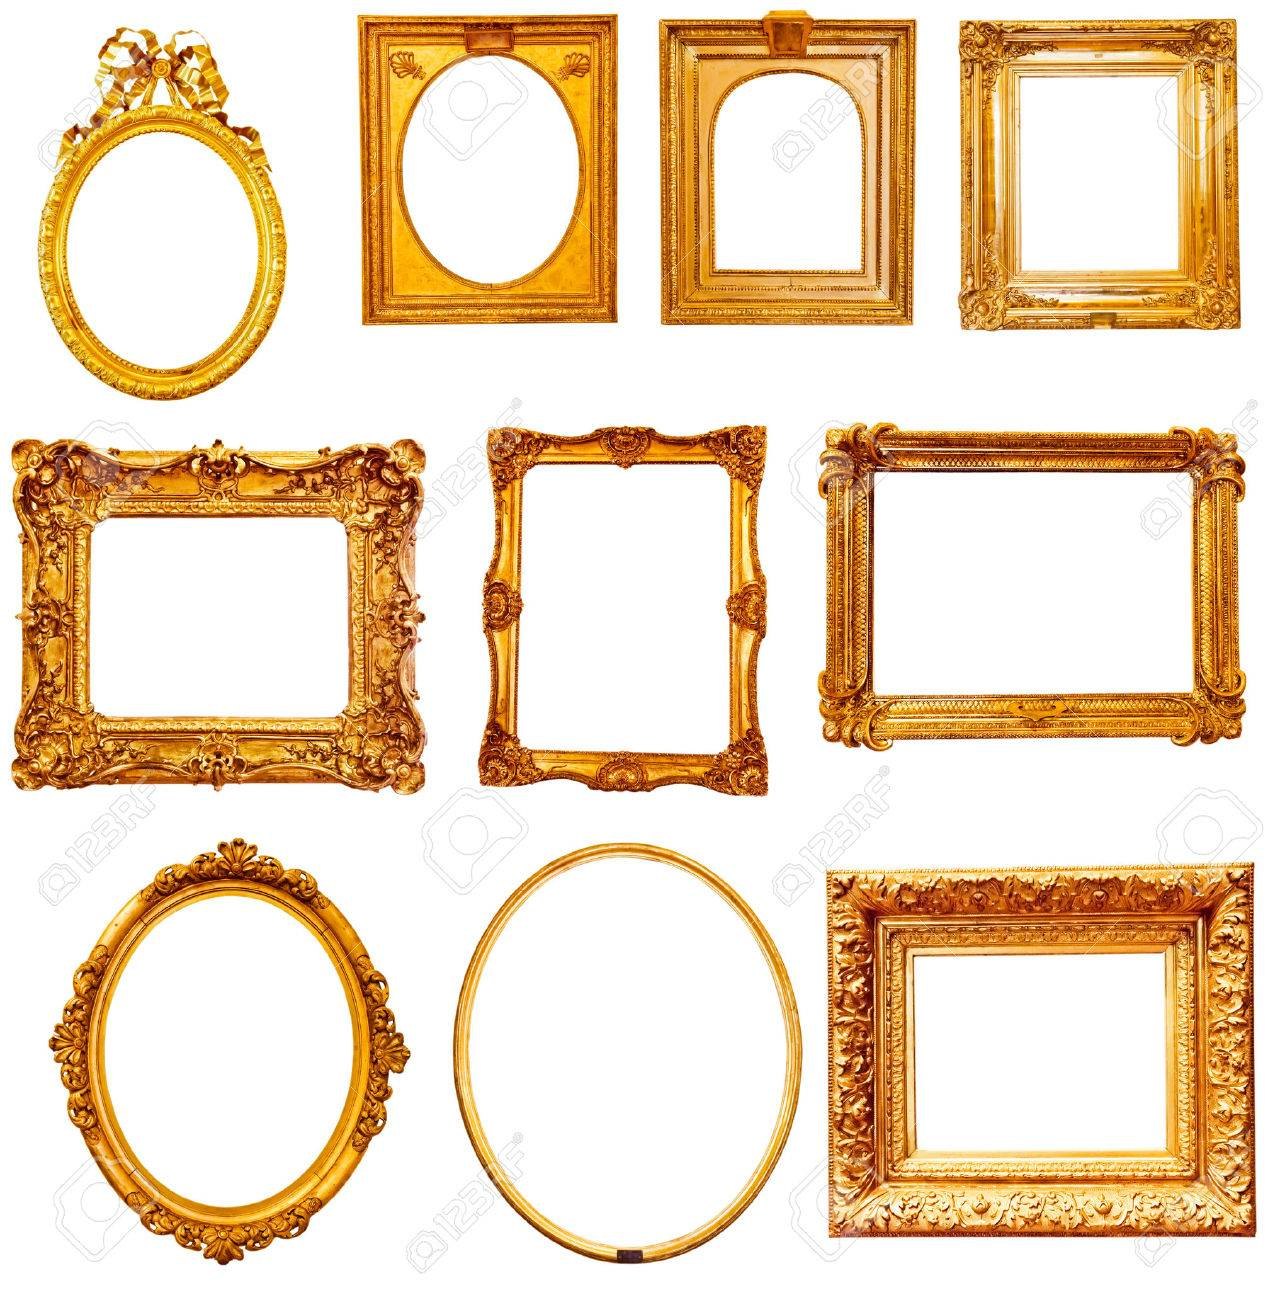 Set of golden vintage frame isolated on white - 33759928